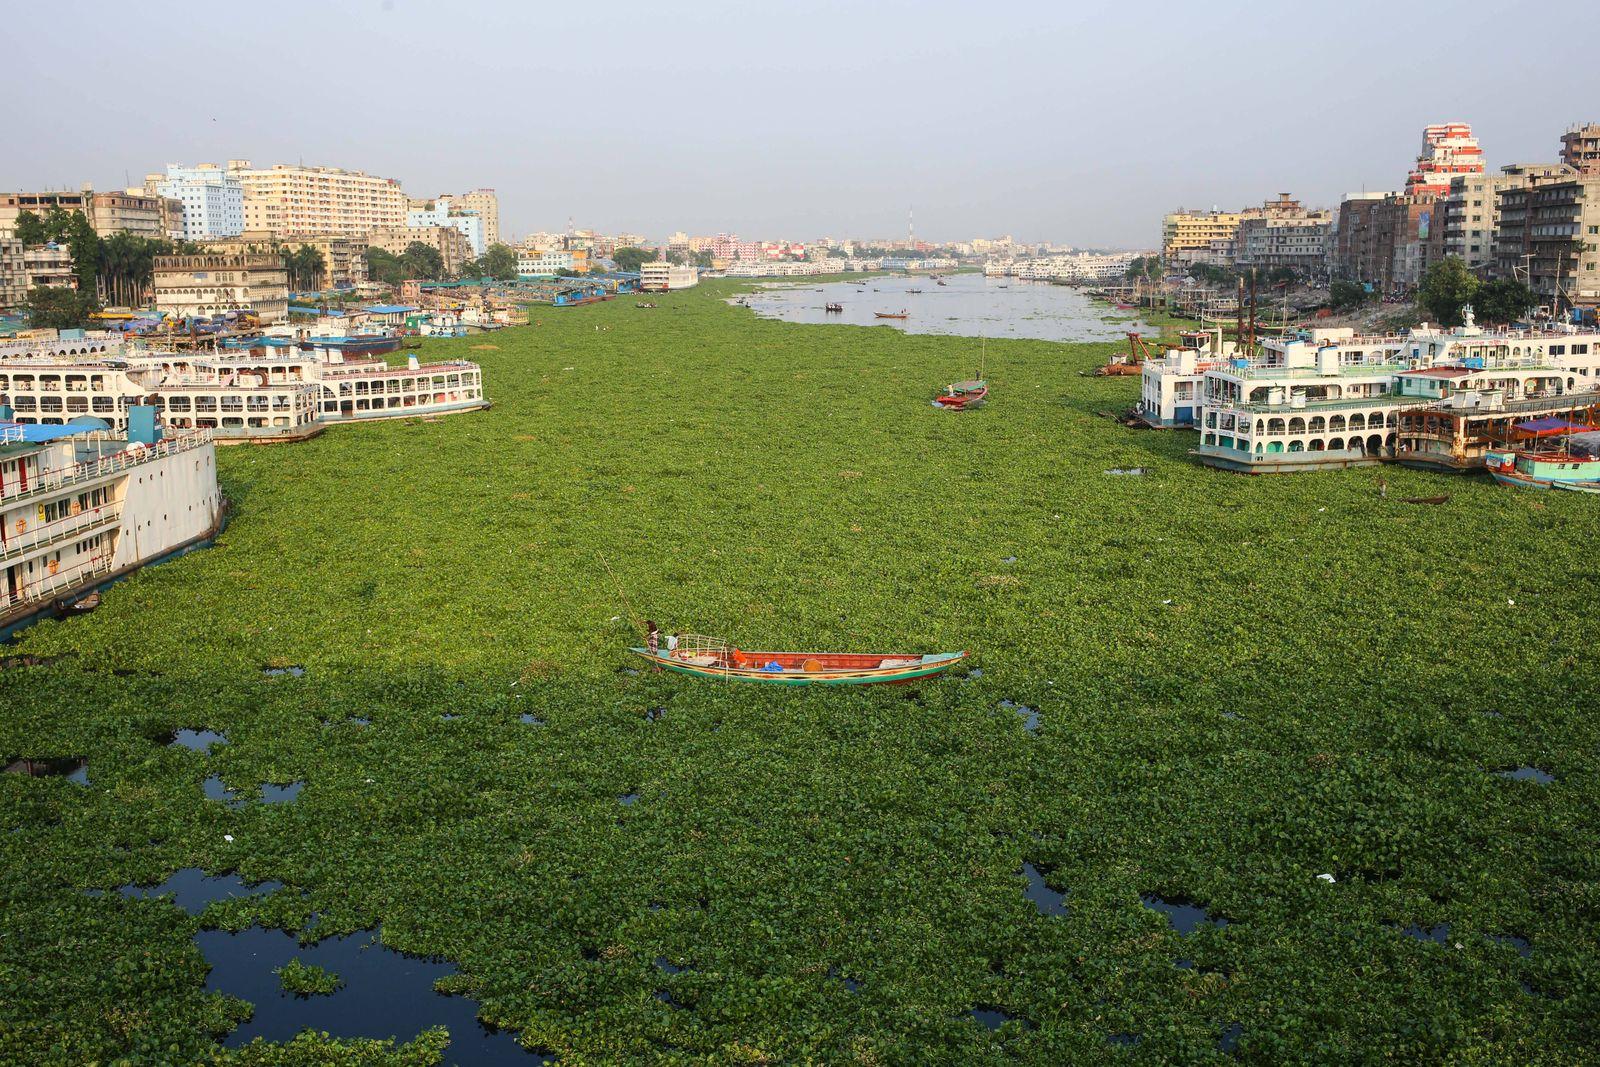 May 16, 2020, Dhaka, Dhaka, Bangladesh: Water hyacinth grows on the Buriganga River, one of the busiest rivers in the wo